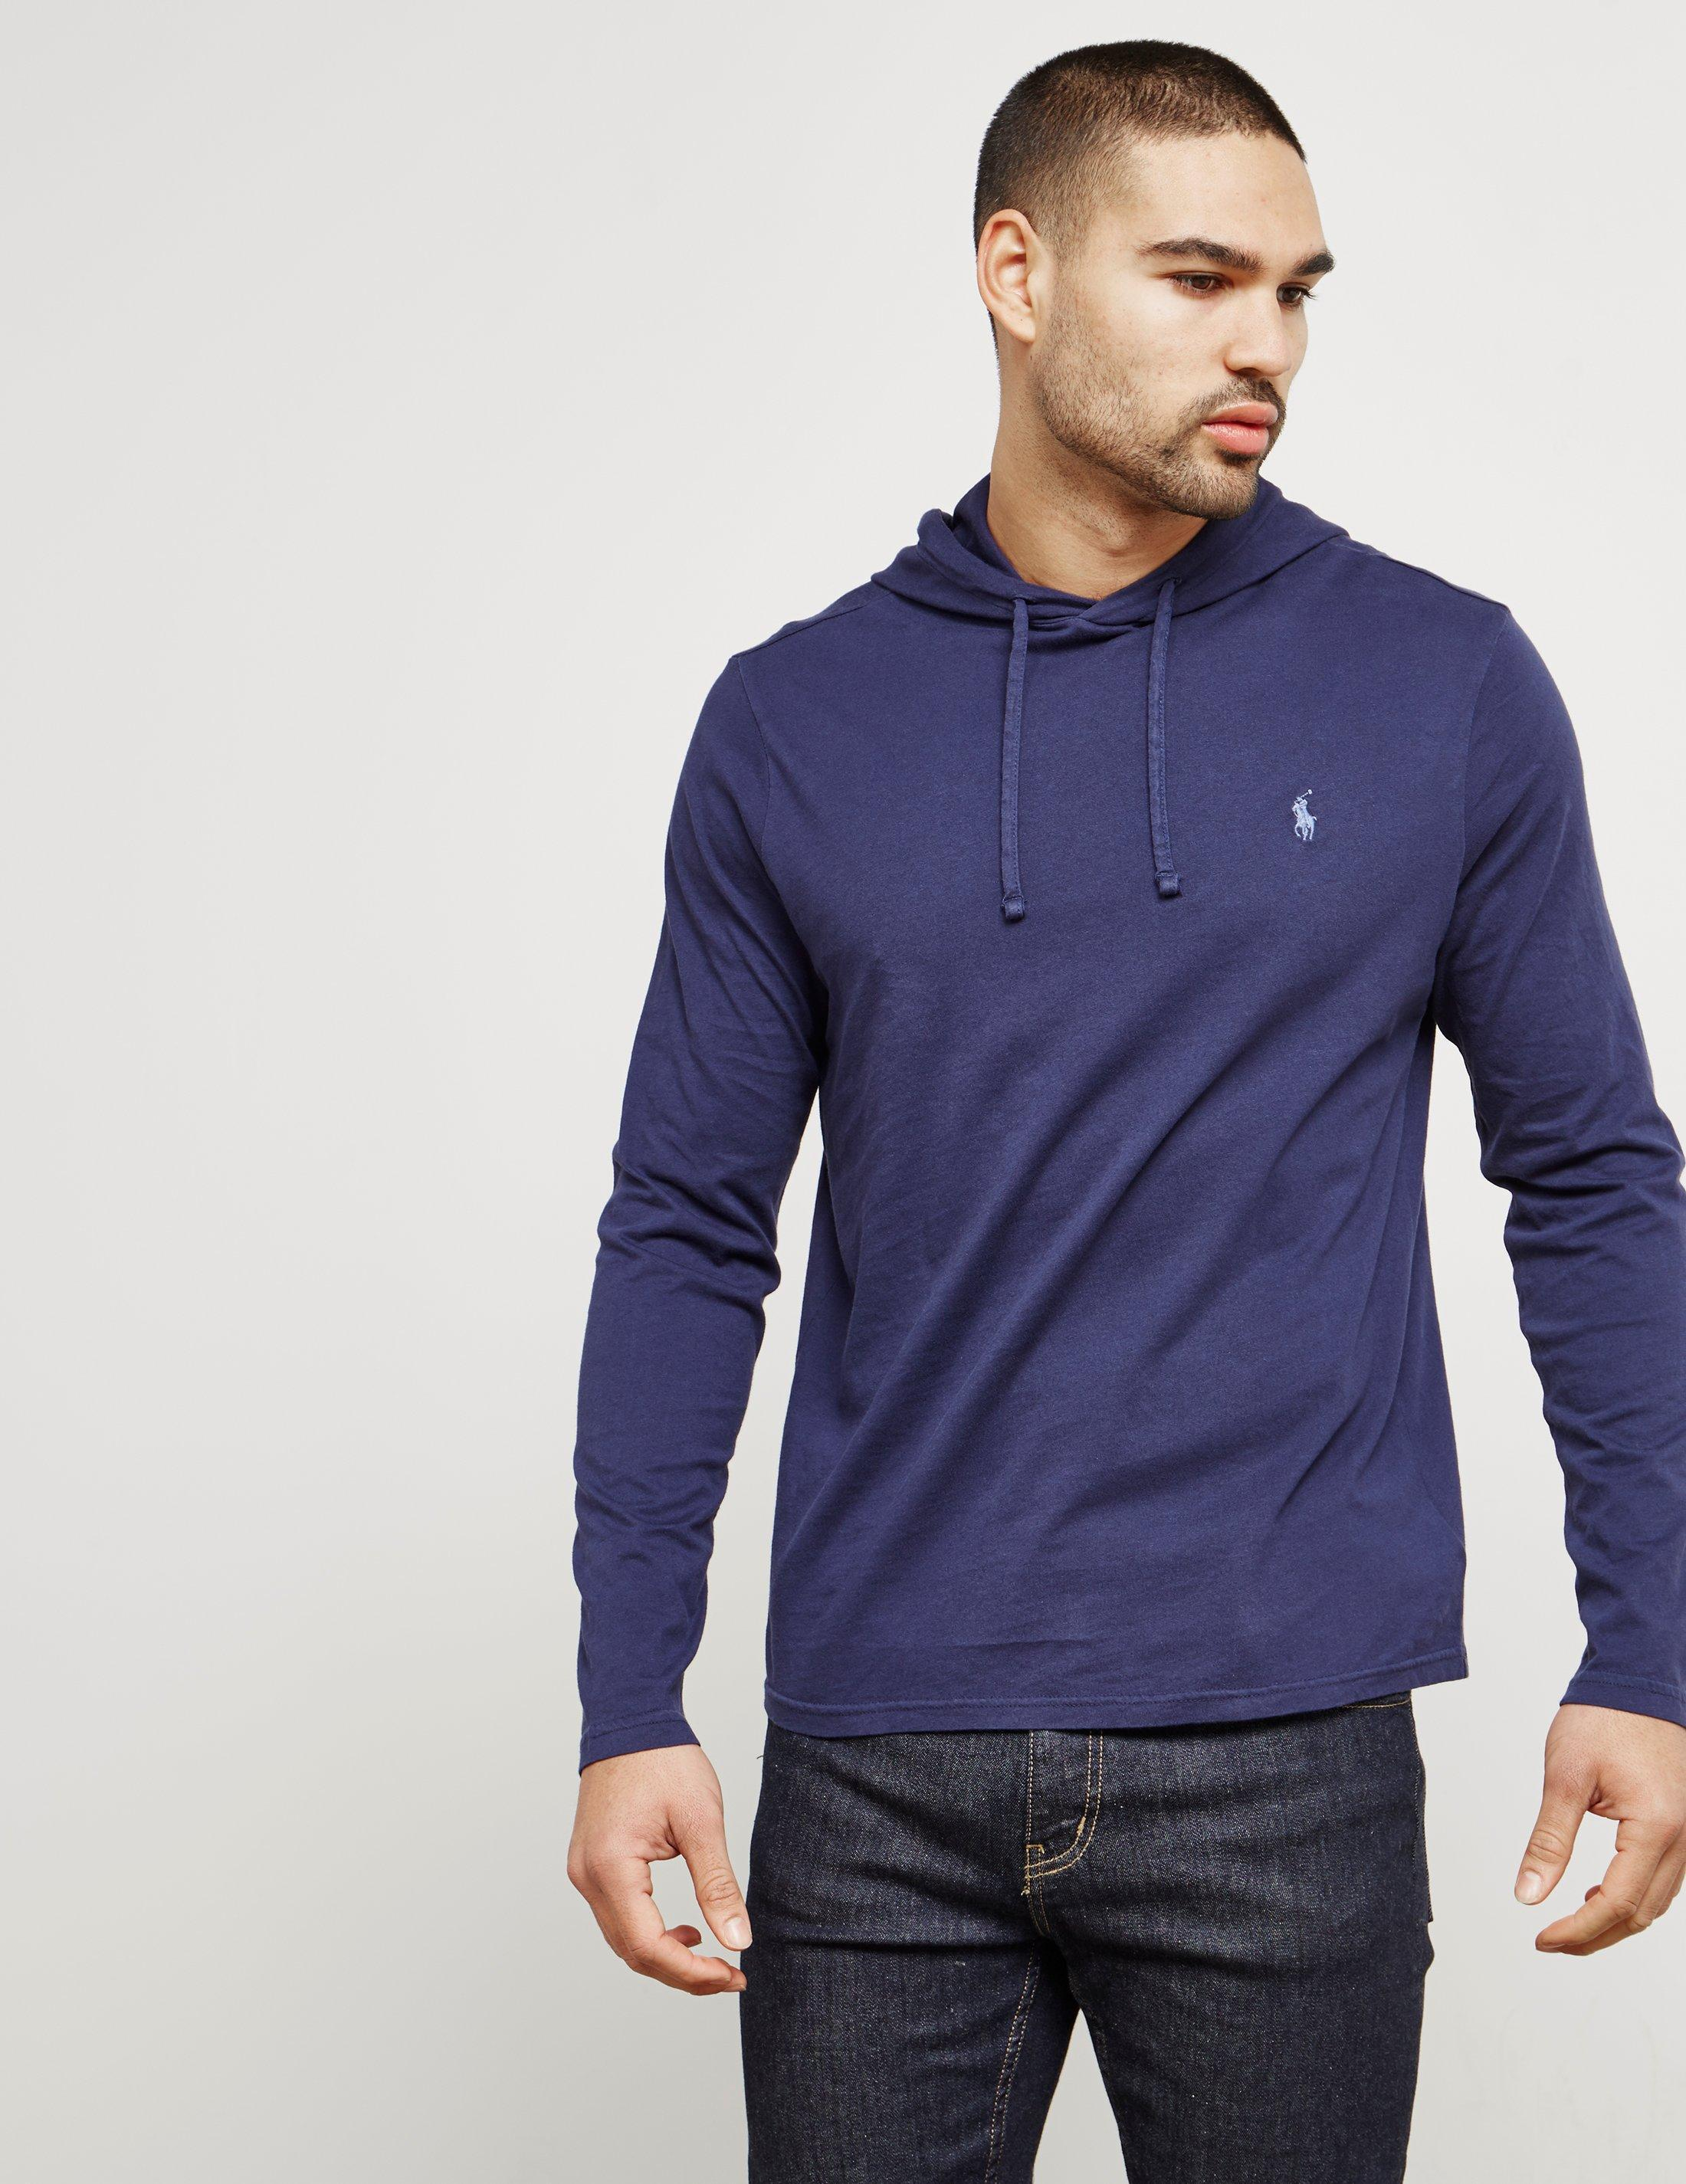 Mens Hooded Long Sleeve T-shirt Navy Blue